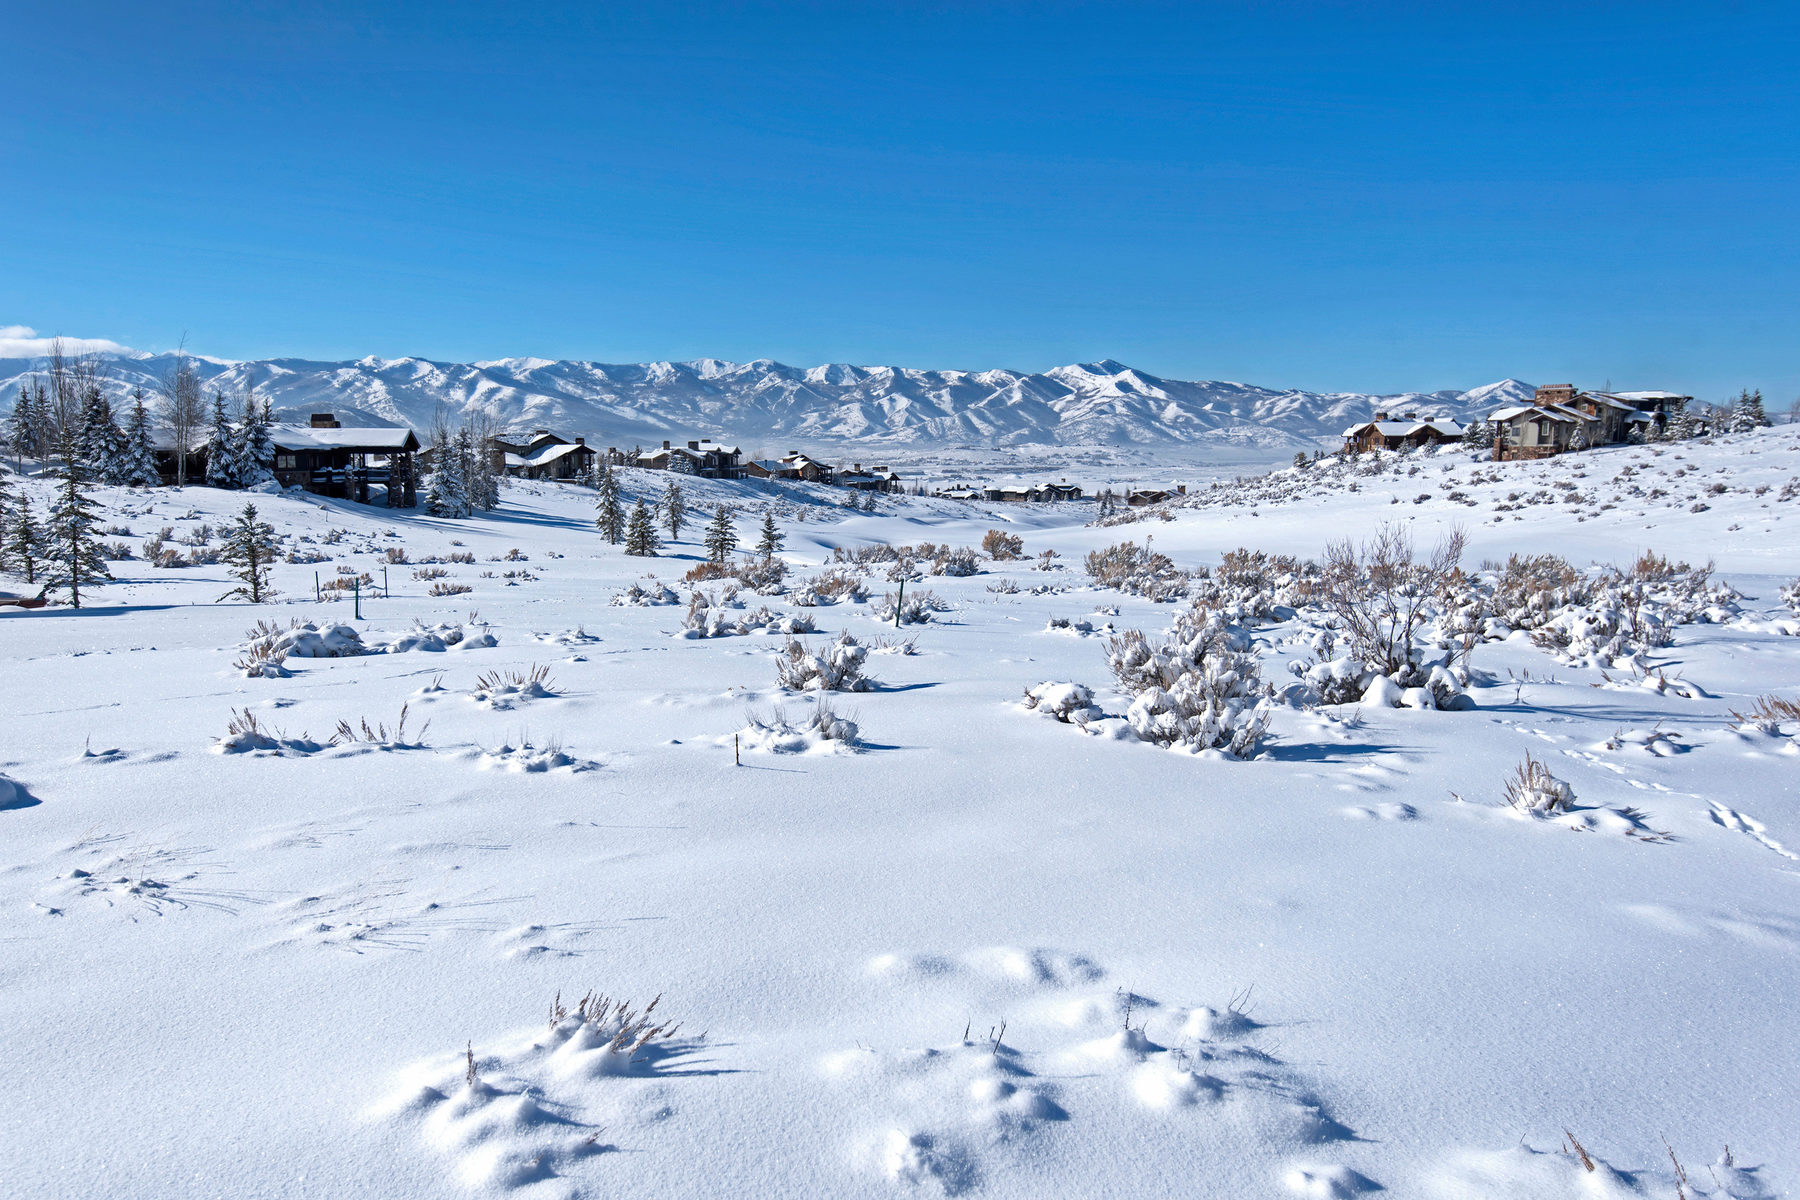 Terreno para Venda às Premier Promontory Ranch Home Site Directly on the Pete Dye Golf Course 3261 Westview Trl Lot 26 Park City, Utah, 84098 Estados Unidos